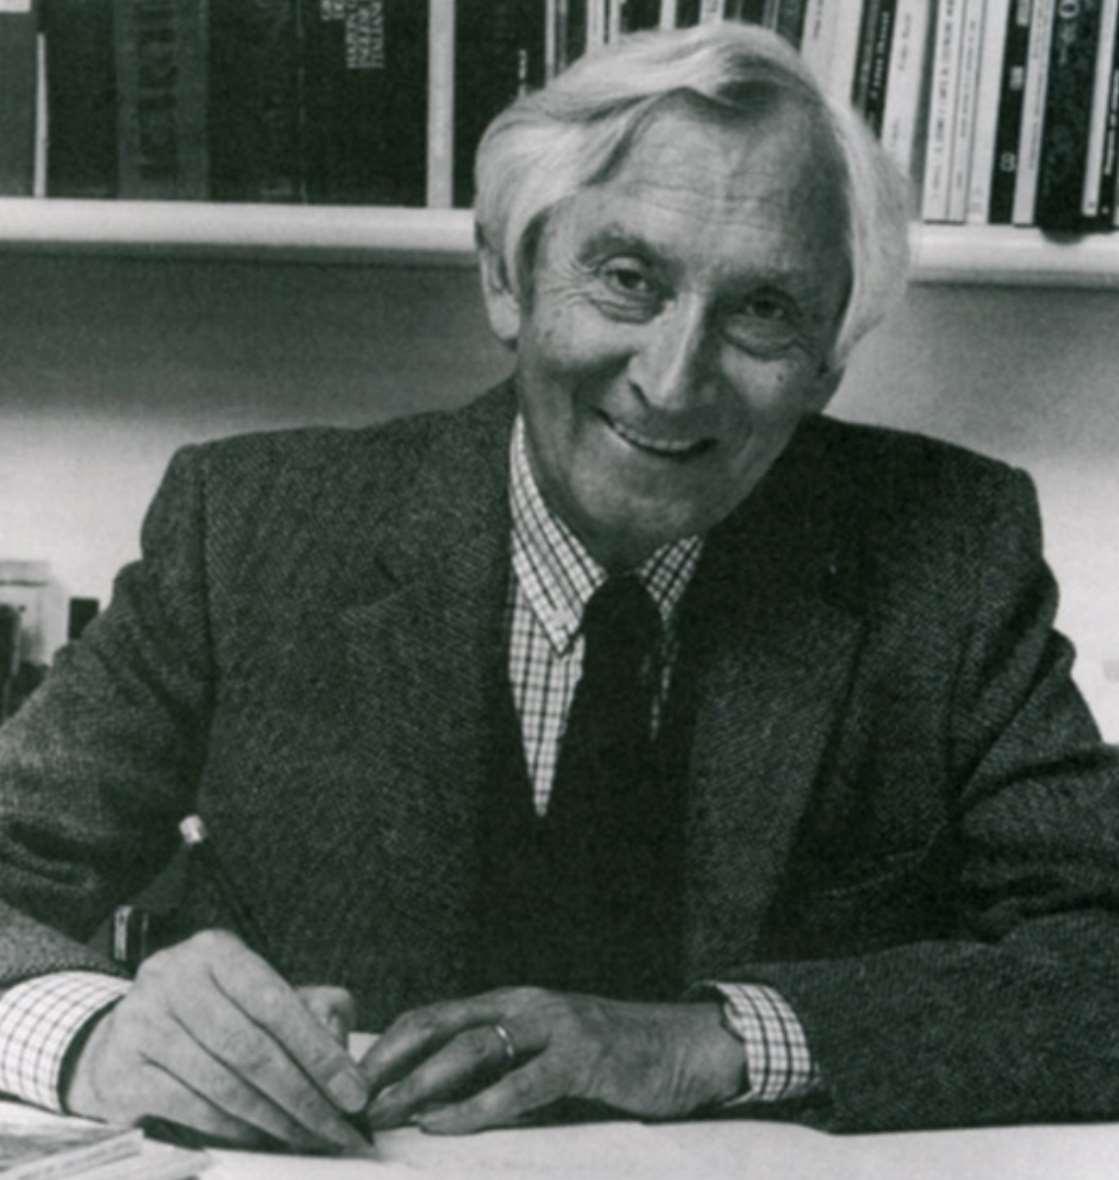 Giotto Stoppino (1926 - 2011)